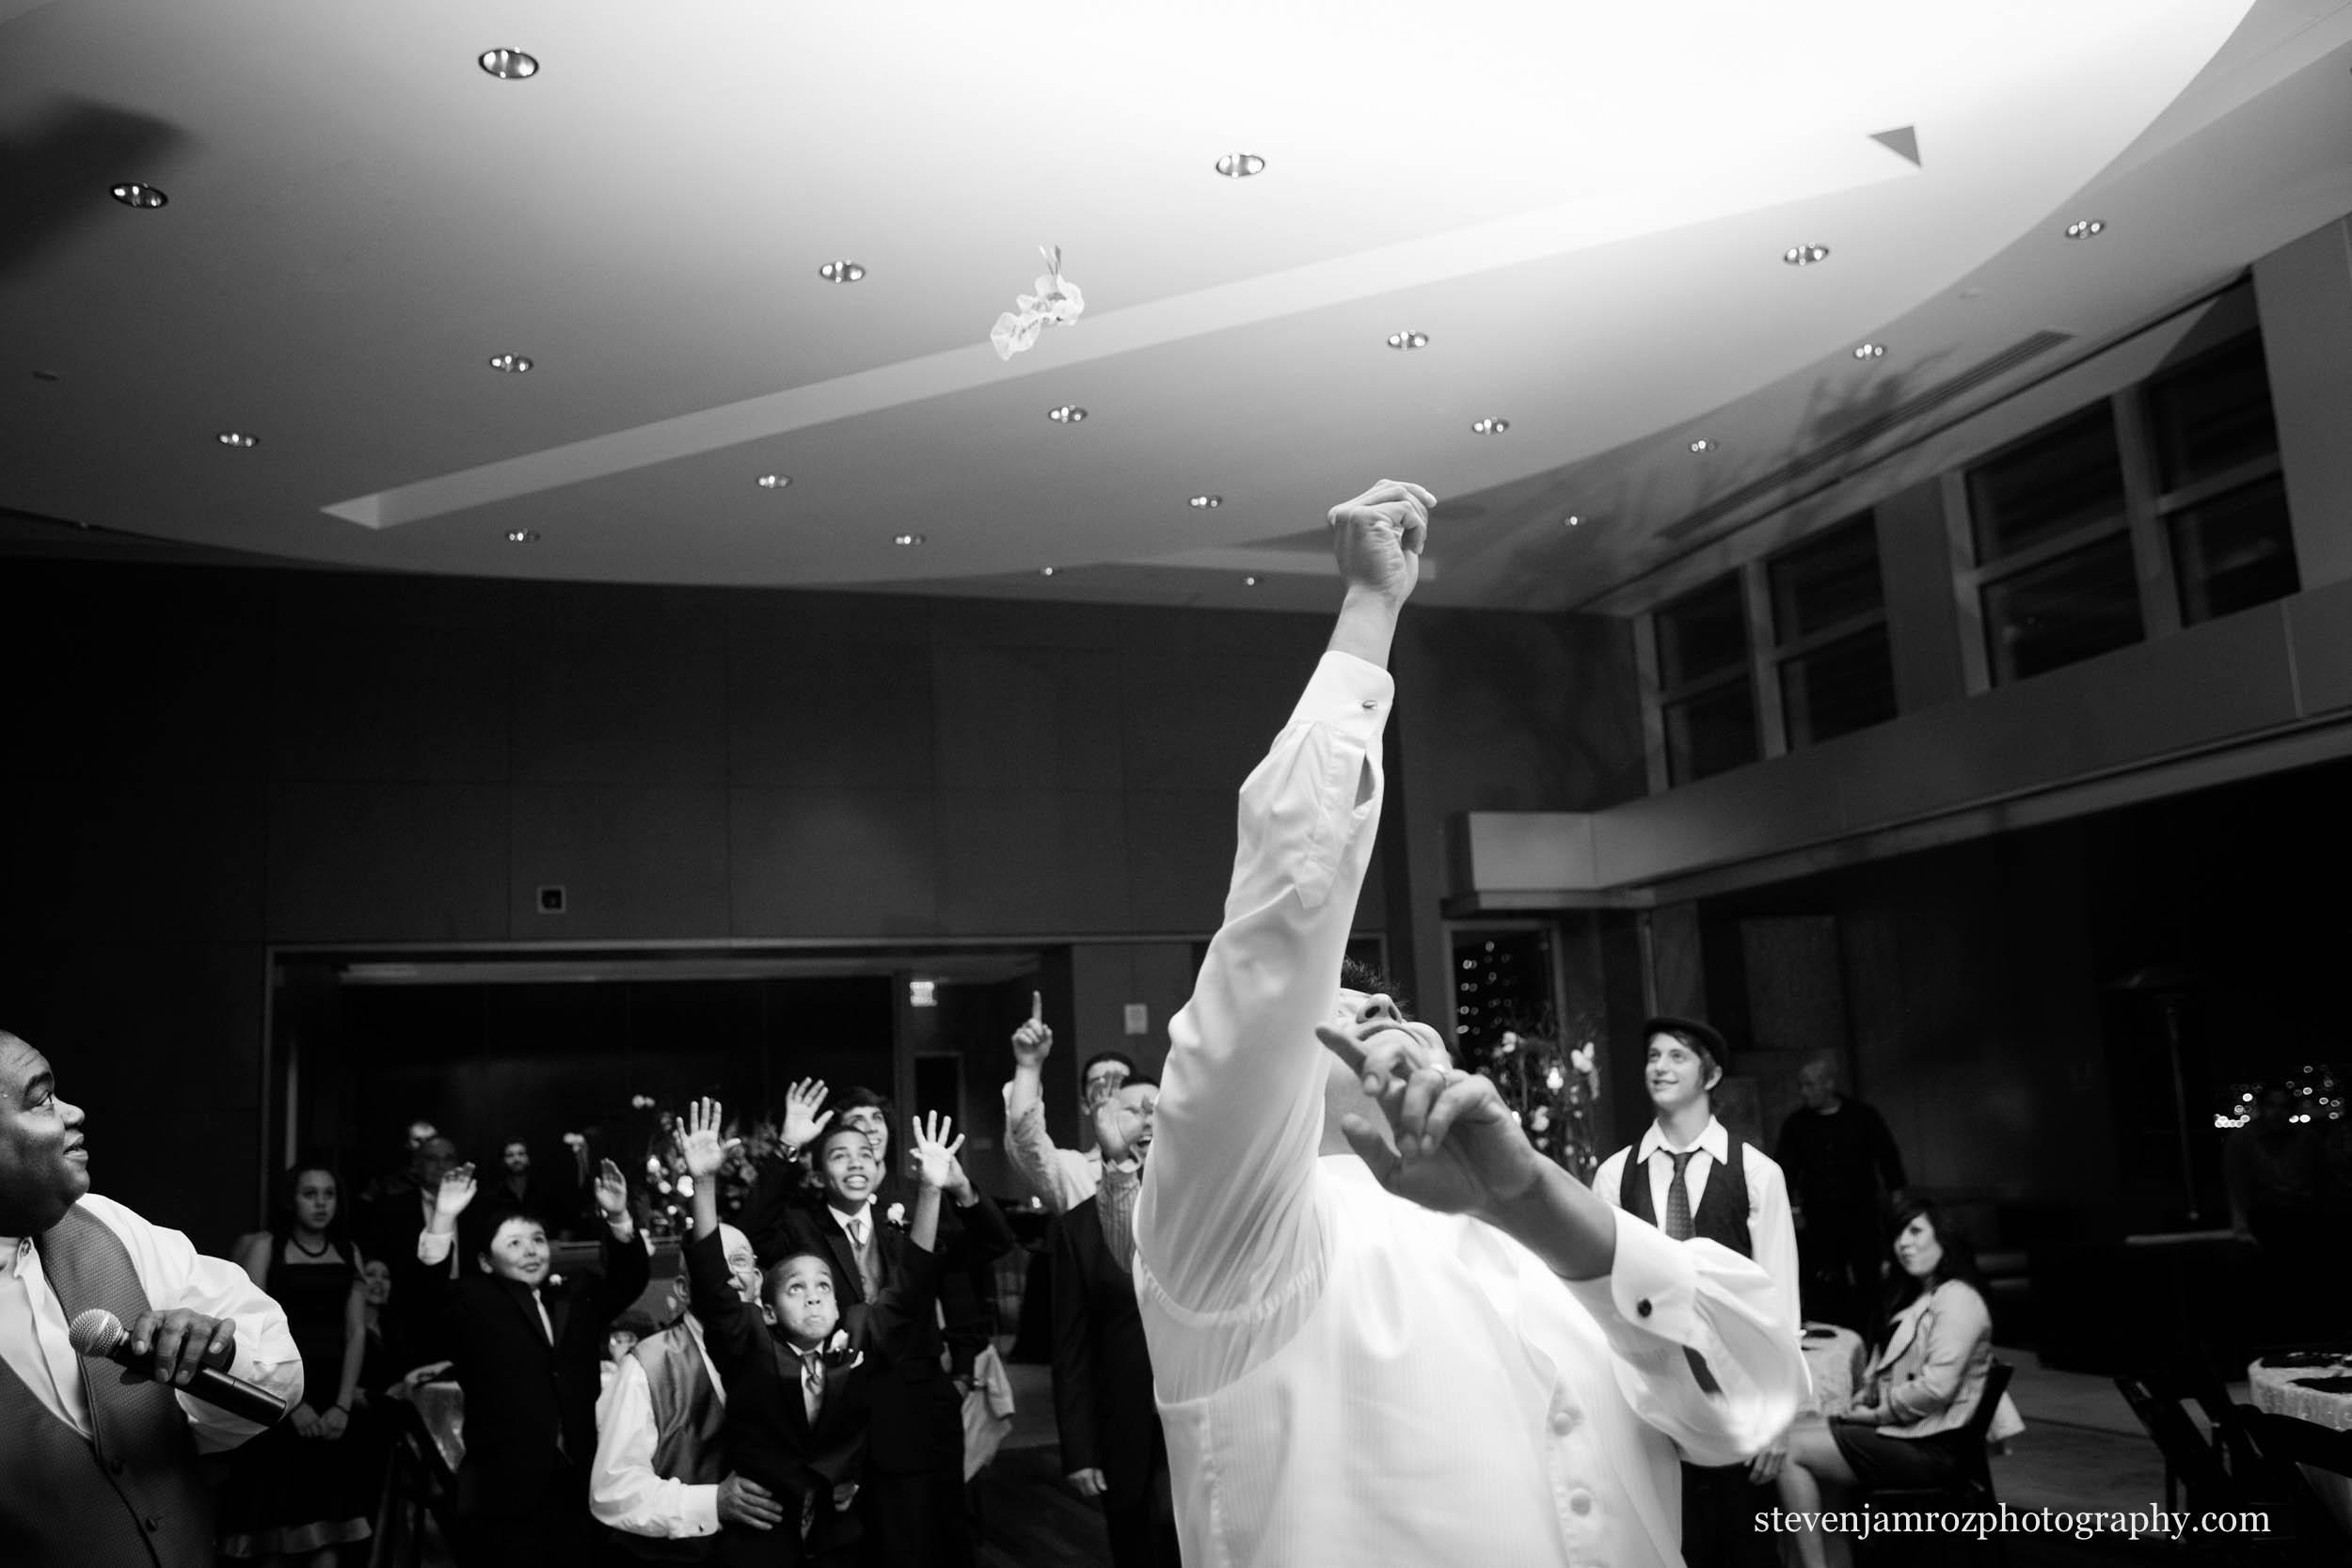 mid-air-garter-toss-excited-steven-jamroz-photography-0284.jpg